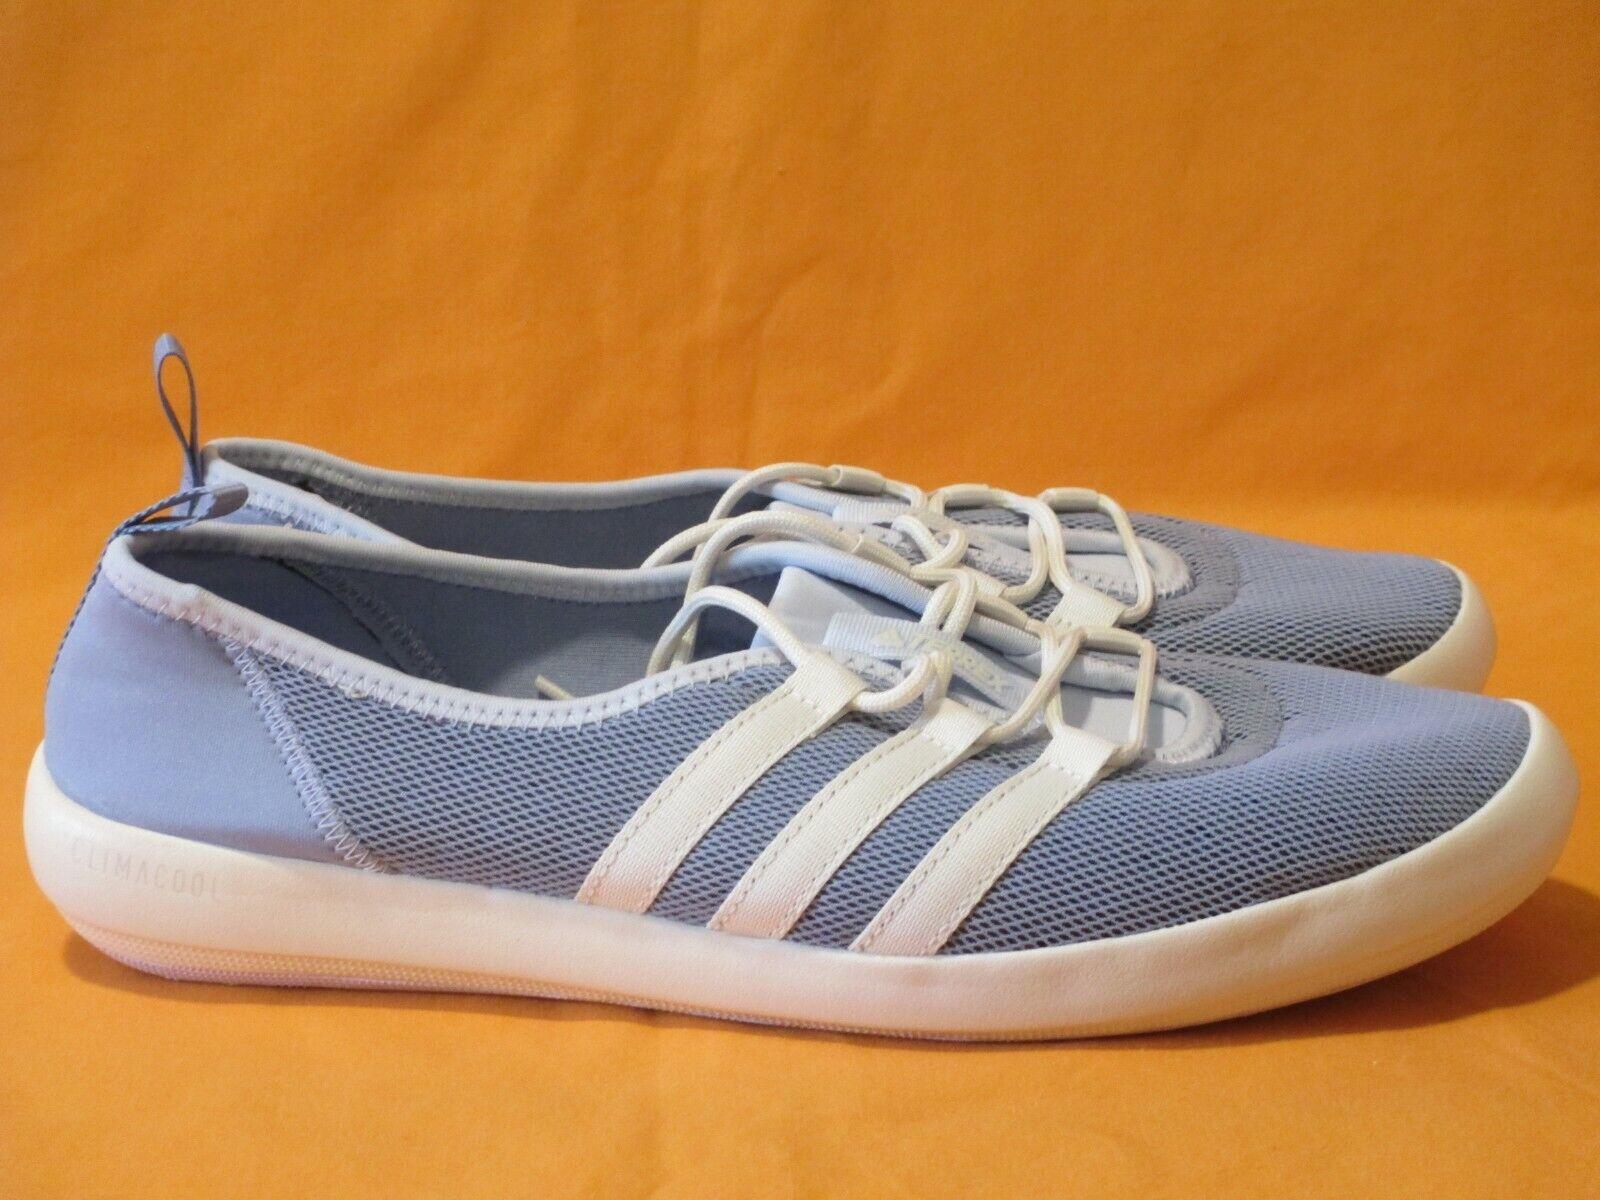 adidas TERREX Climacool Sleek Boat Shoes | Adidas sneakers